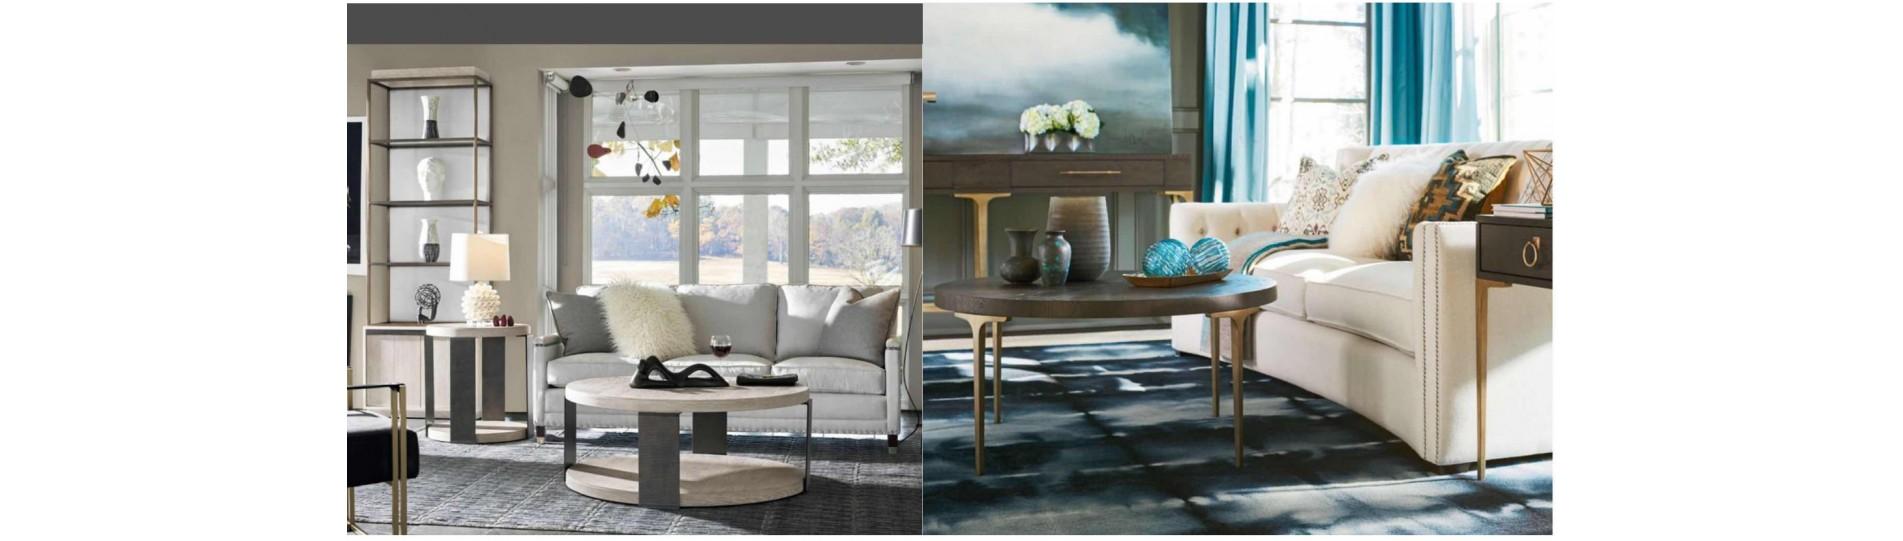 leather sofa richmond hill sofas cama corte ingles madrid joyce decor